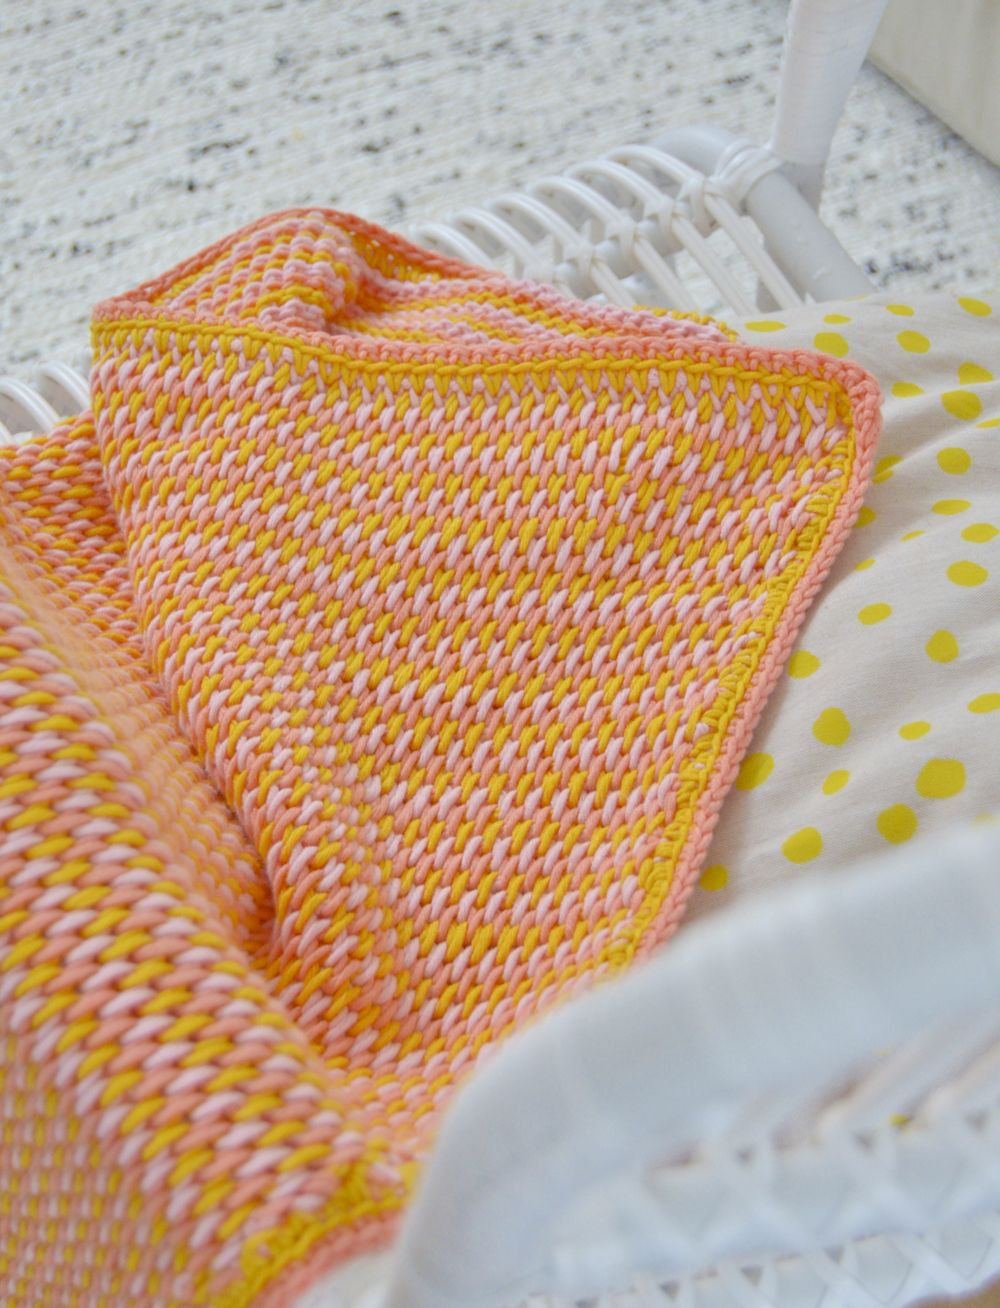 Tunisian full stitch crochet blanket from byclaire crochet tunisian crochet patterns bankloansurffo Gallery